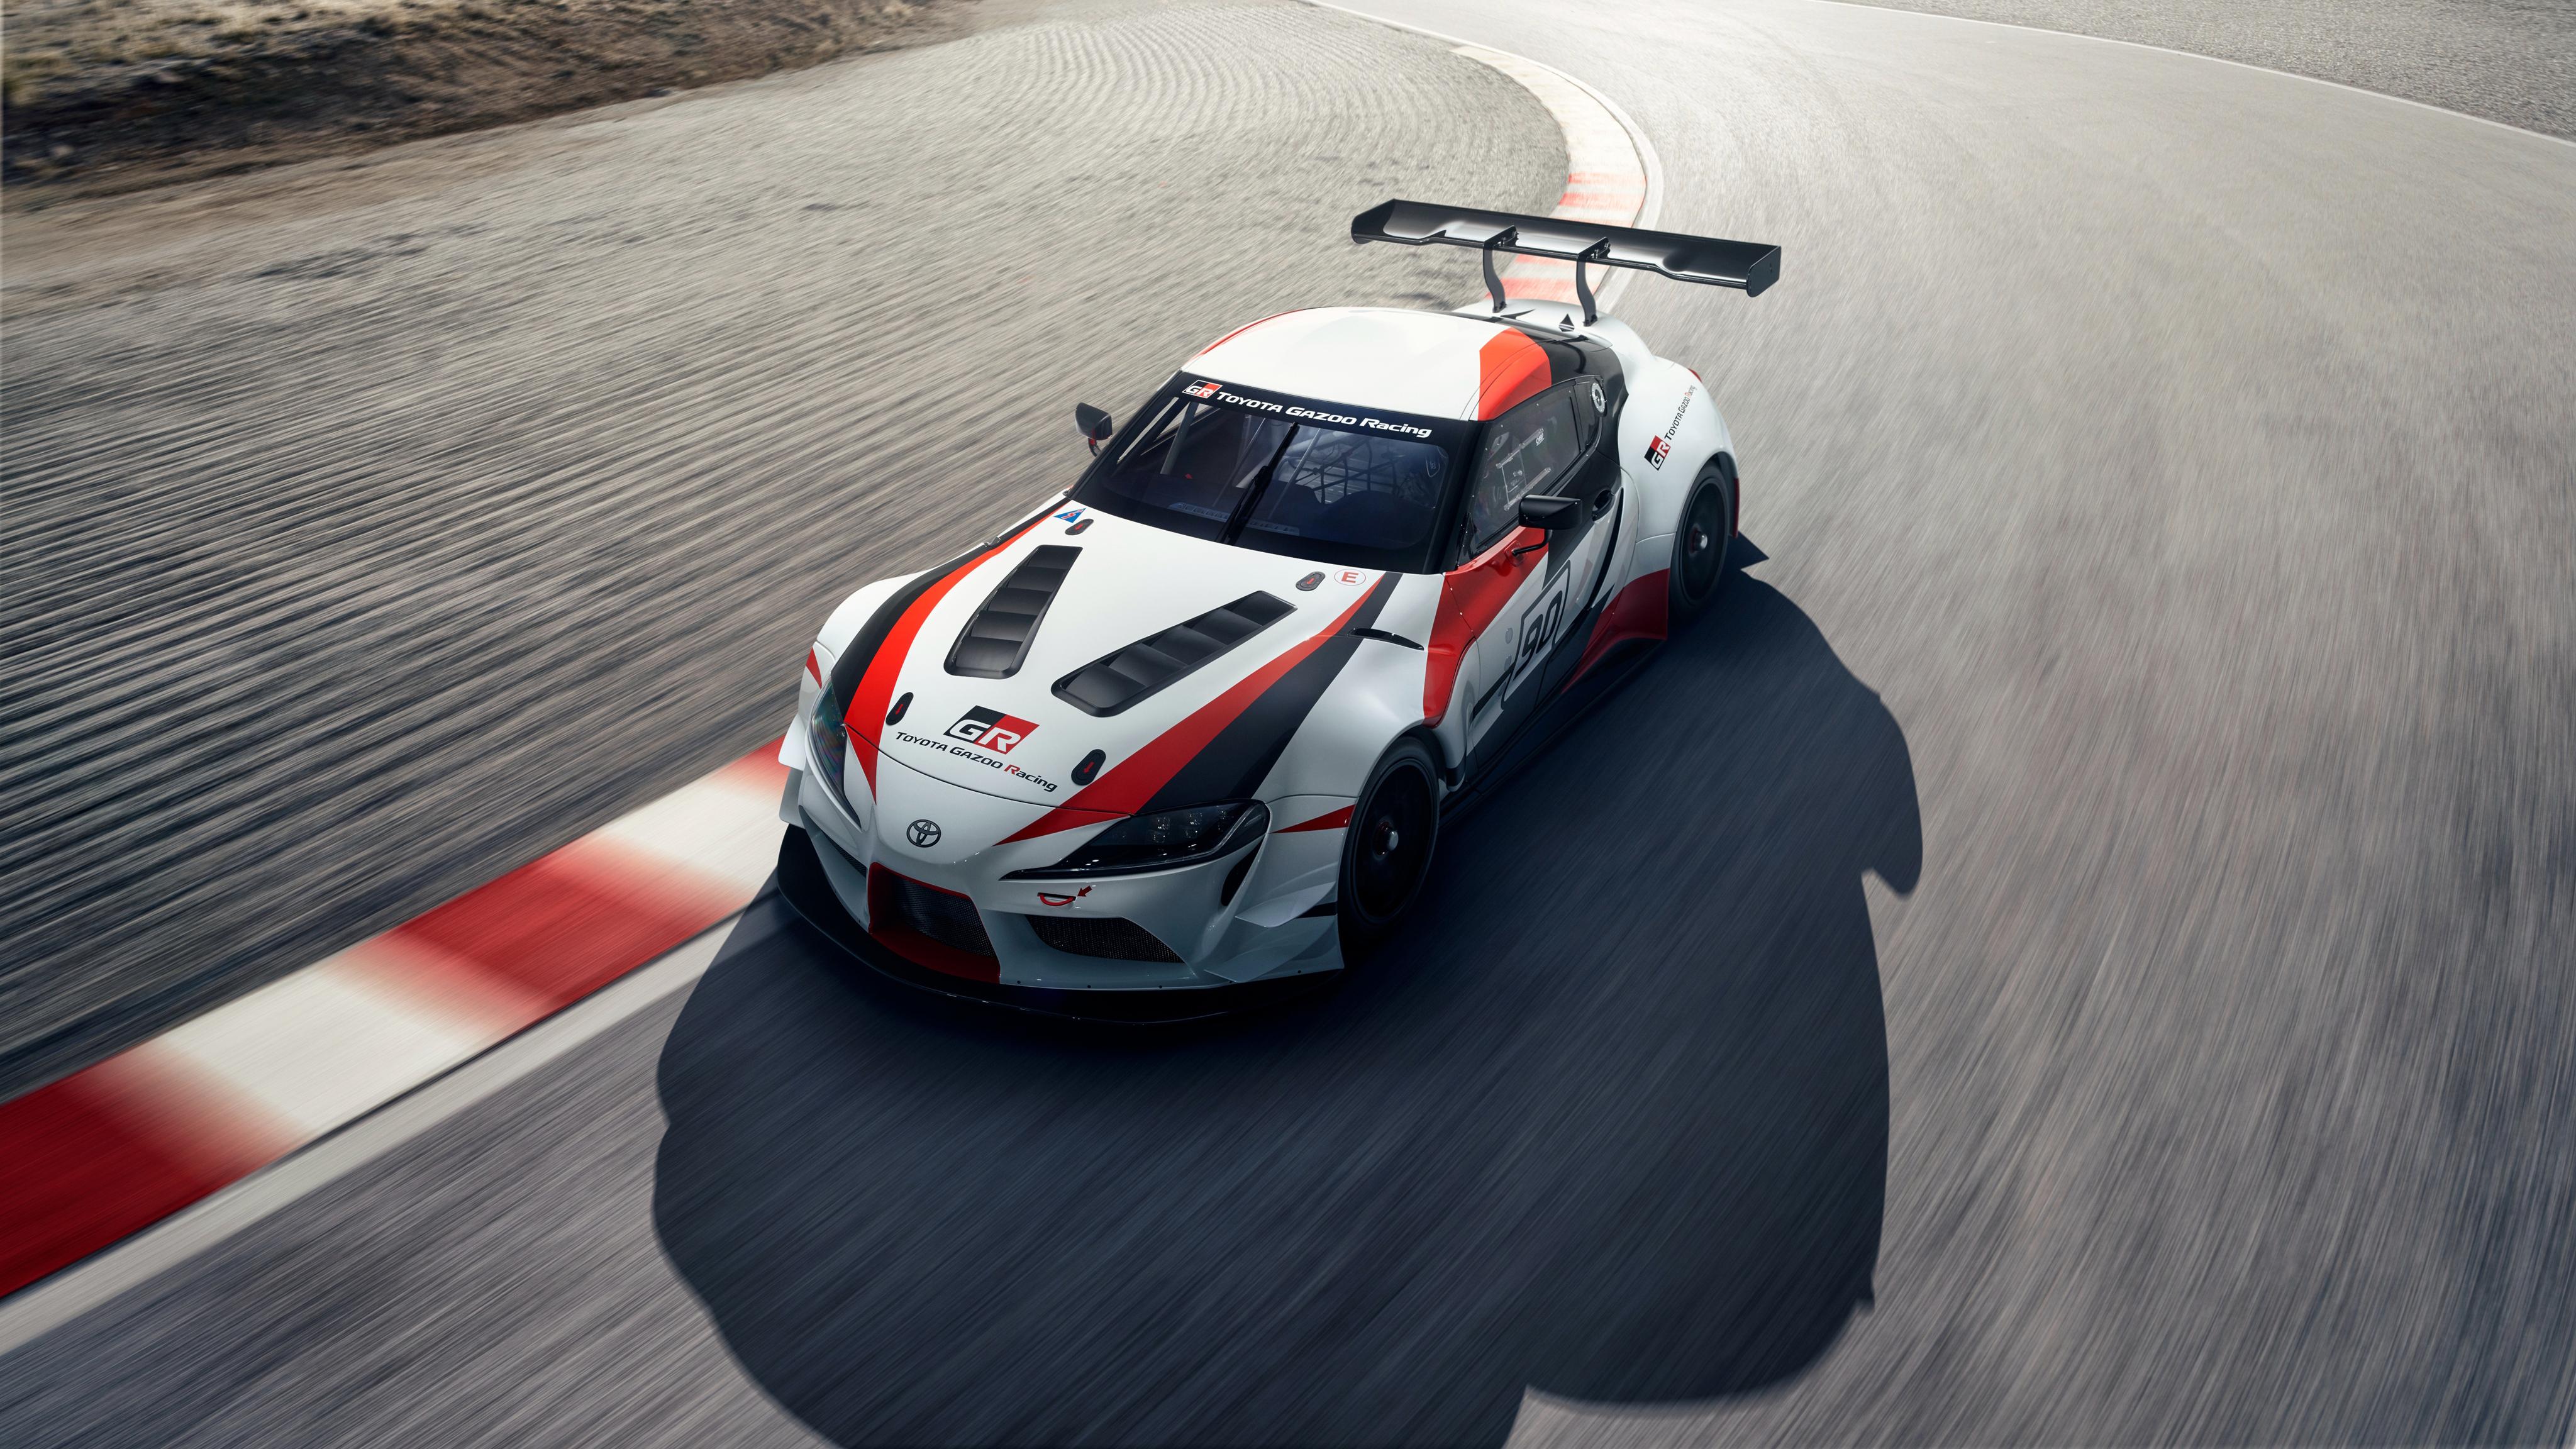 2018 Toyota GR Supra Racing Concept 4K 4 Wallpaper